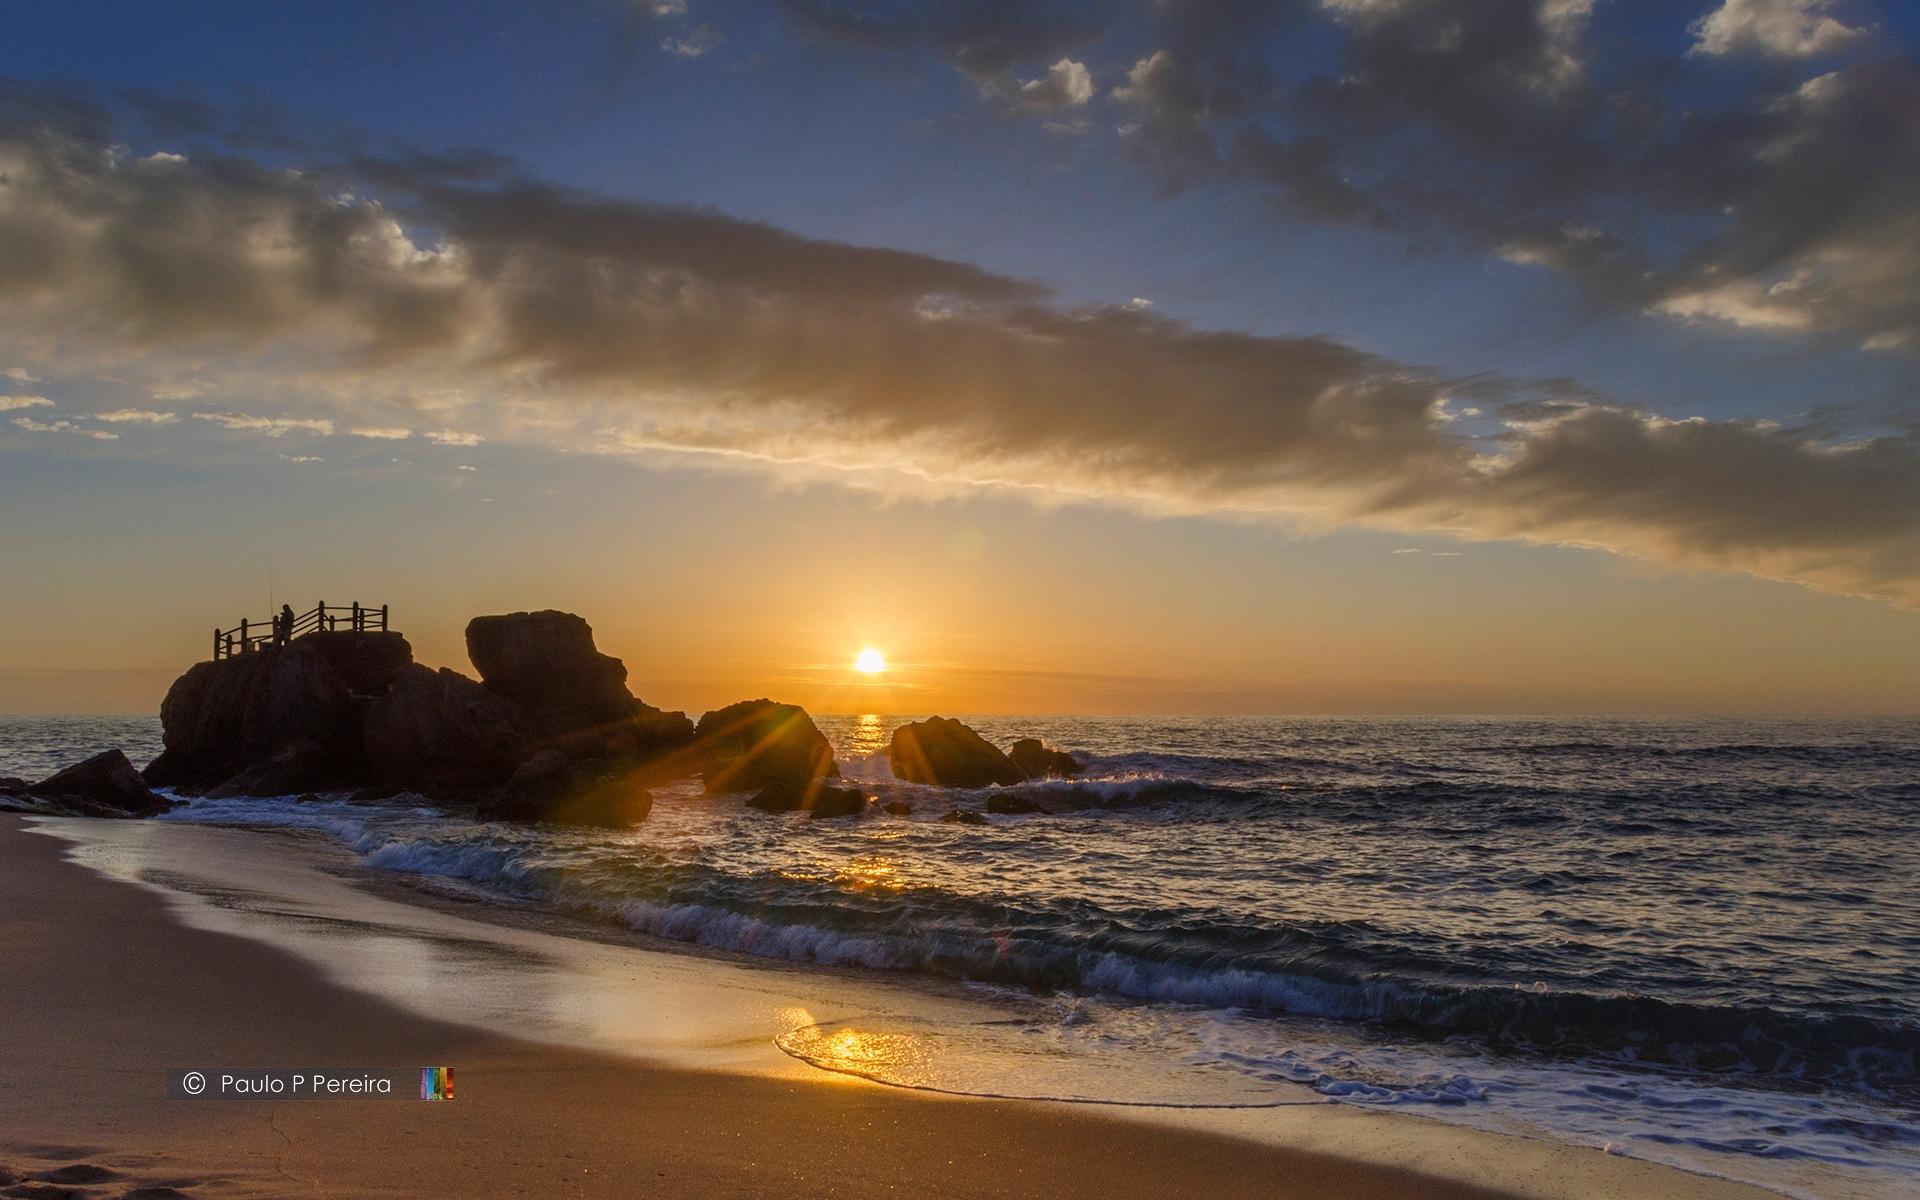 microsoft微软《葡萄牙海岸》桌面主题